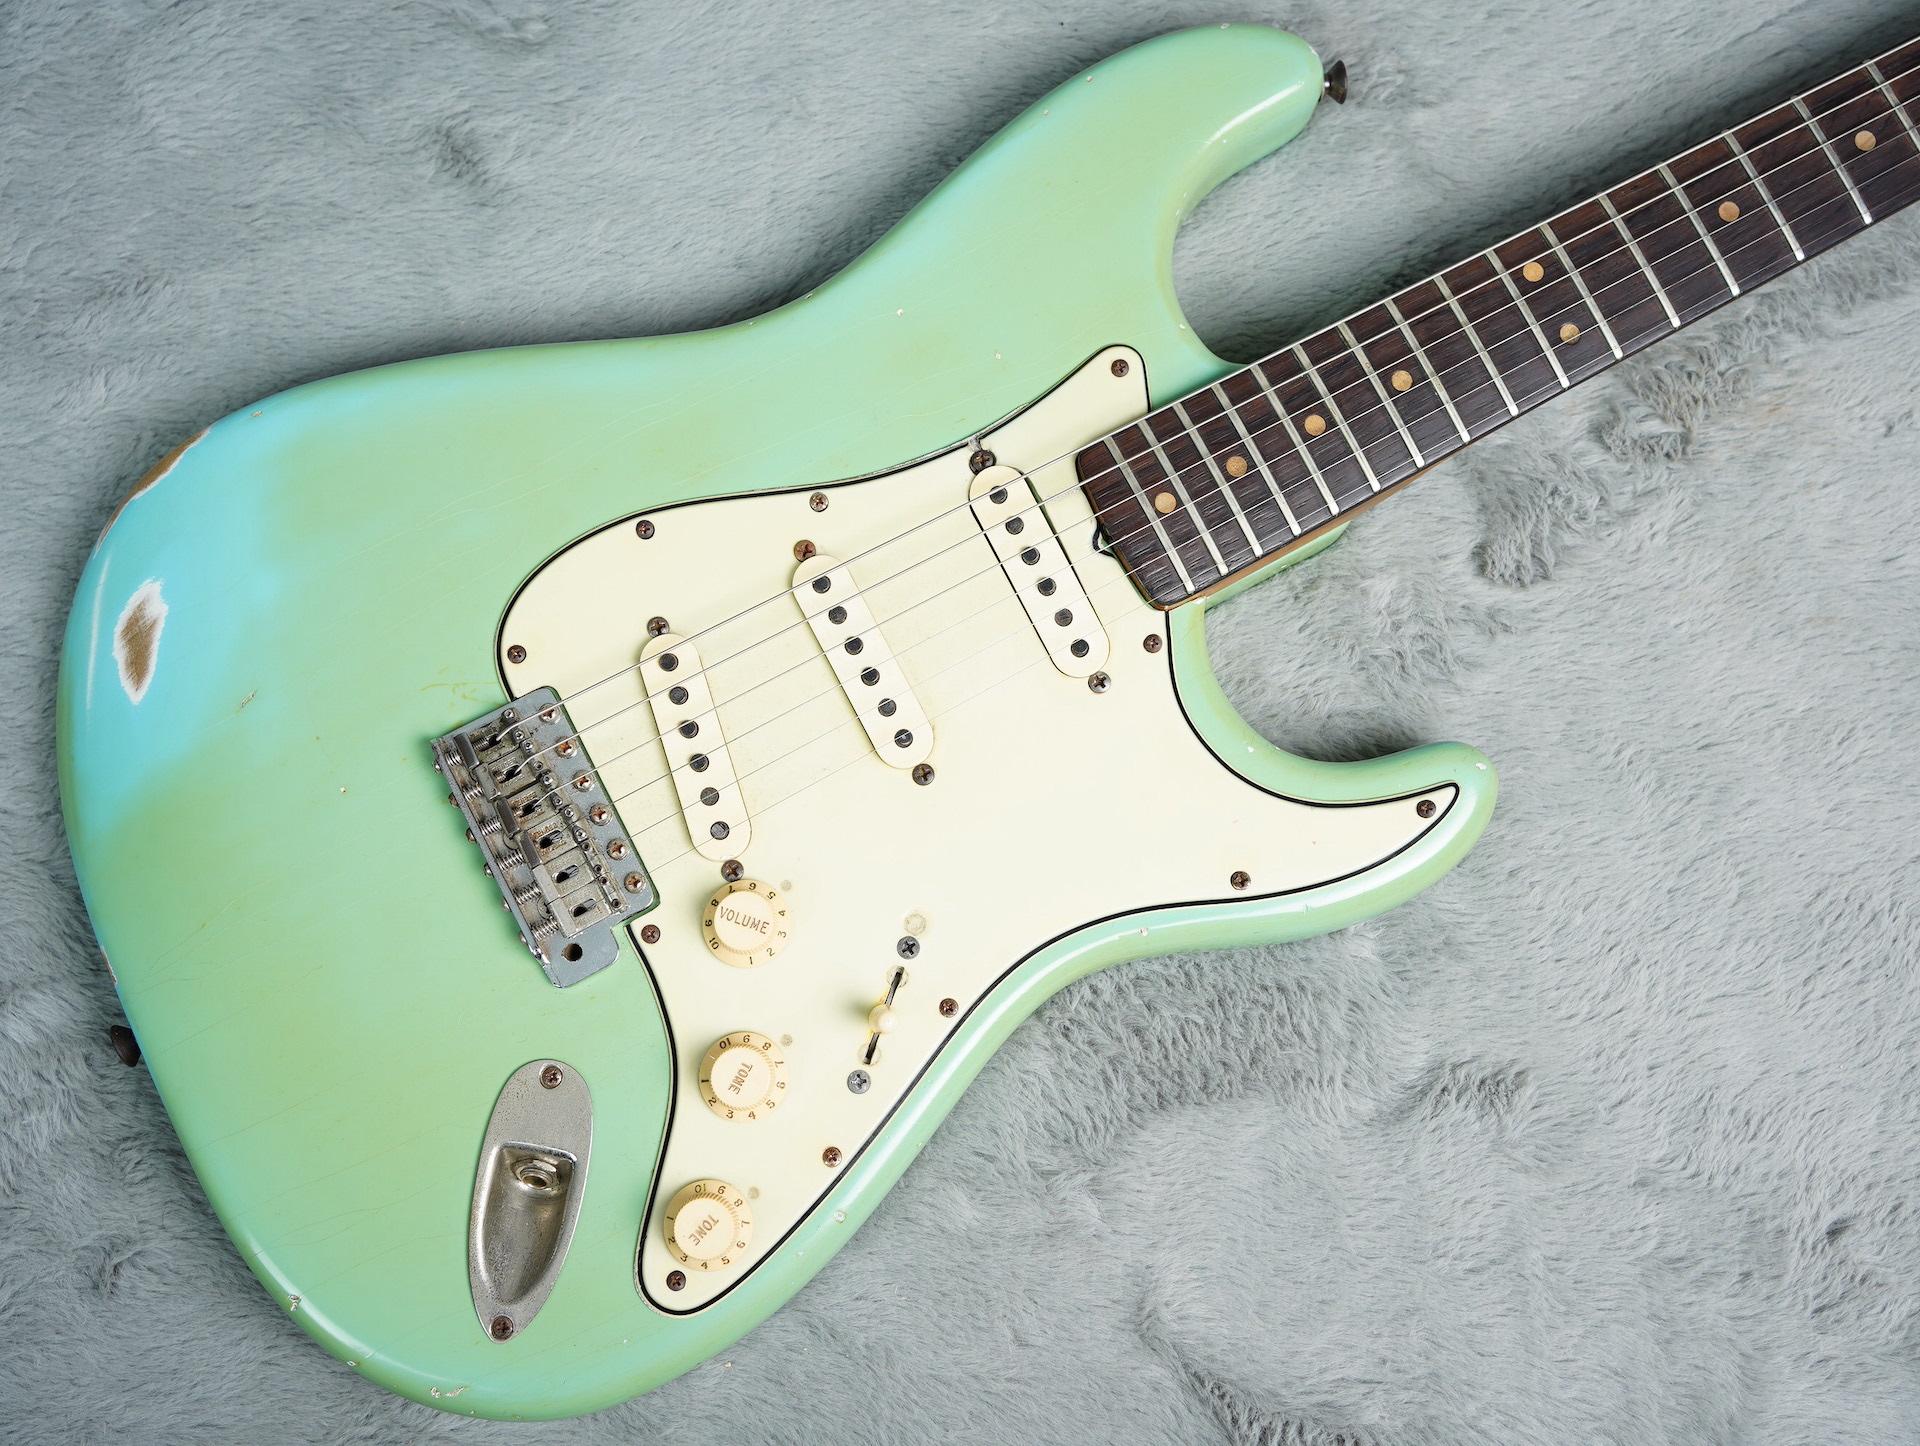 1964 Fender Stratocaster Daphne Blue refin + HSC